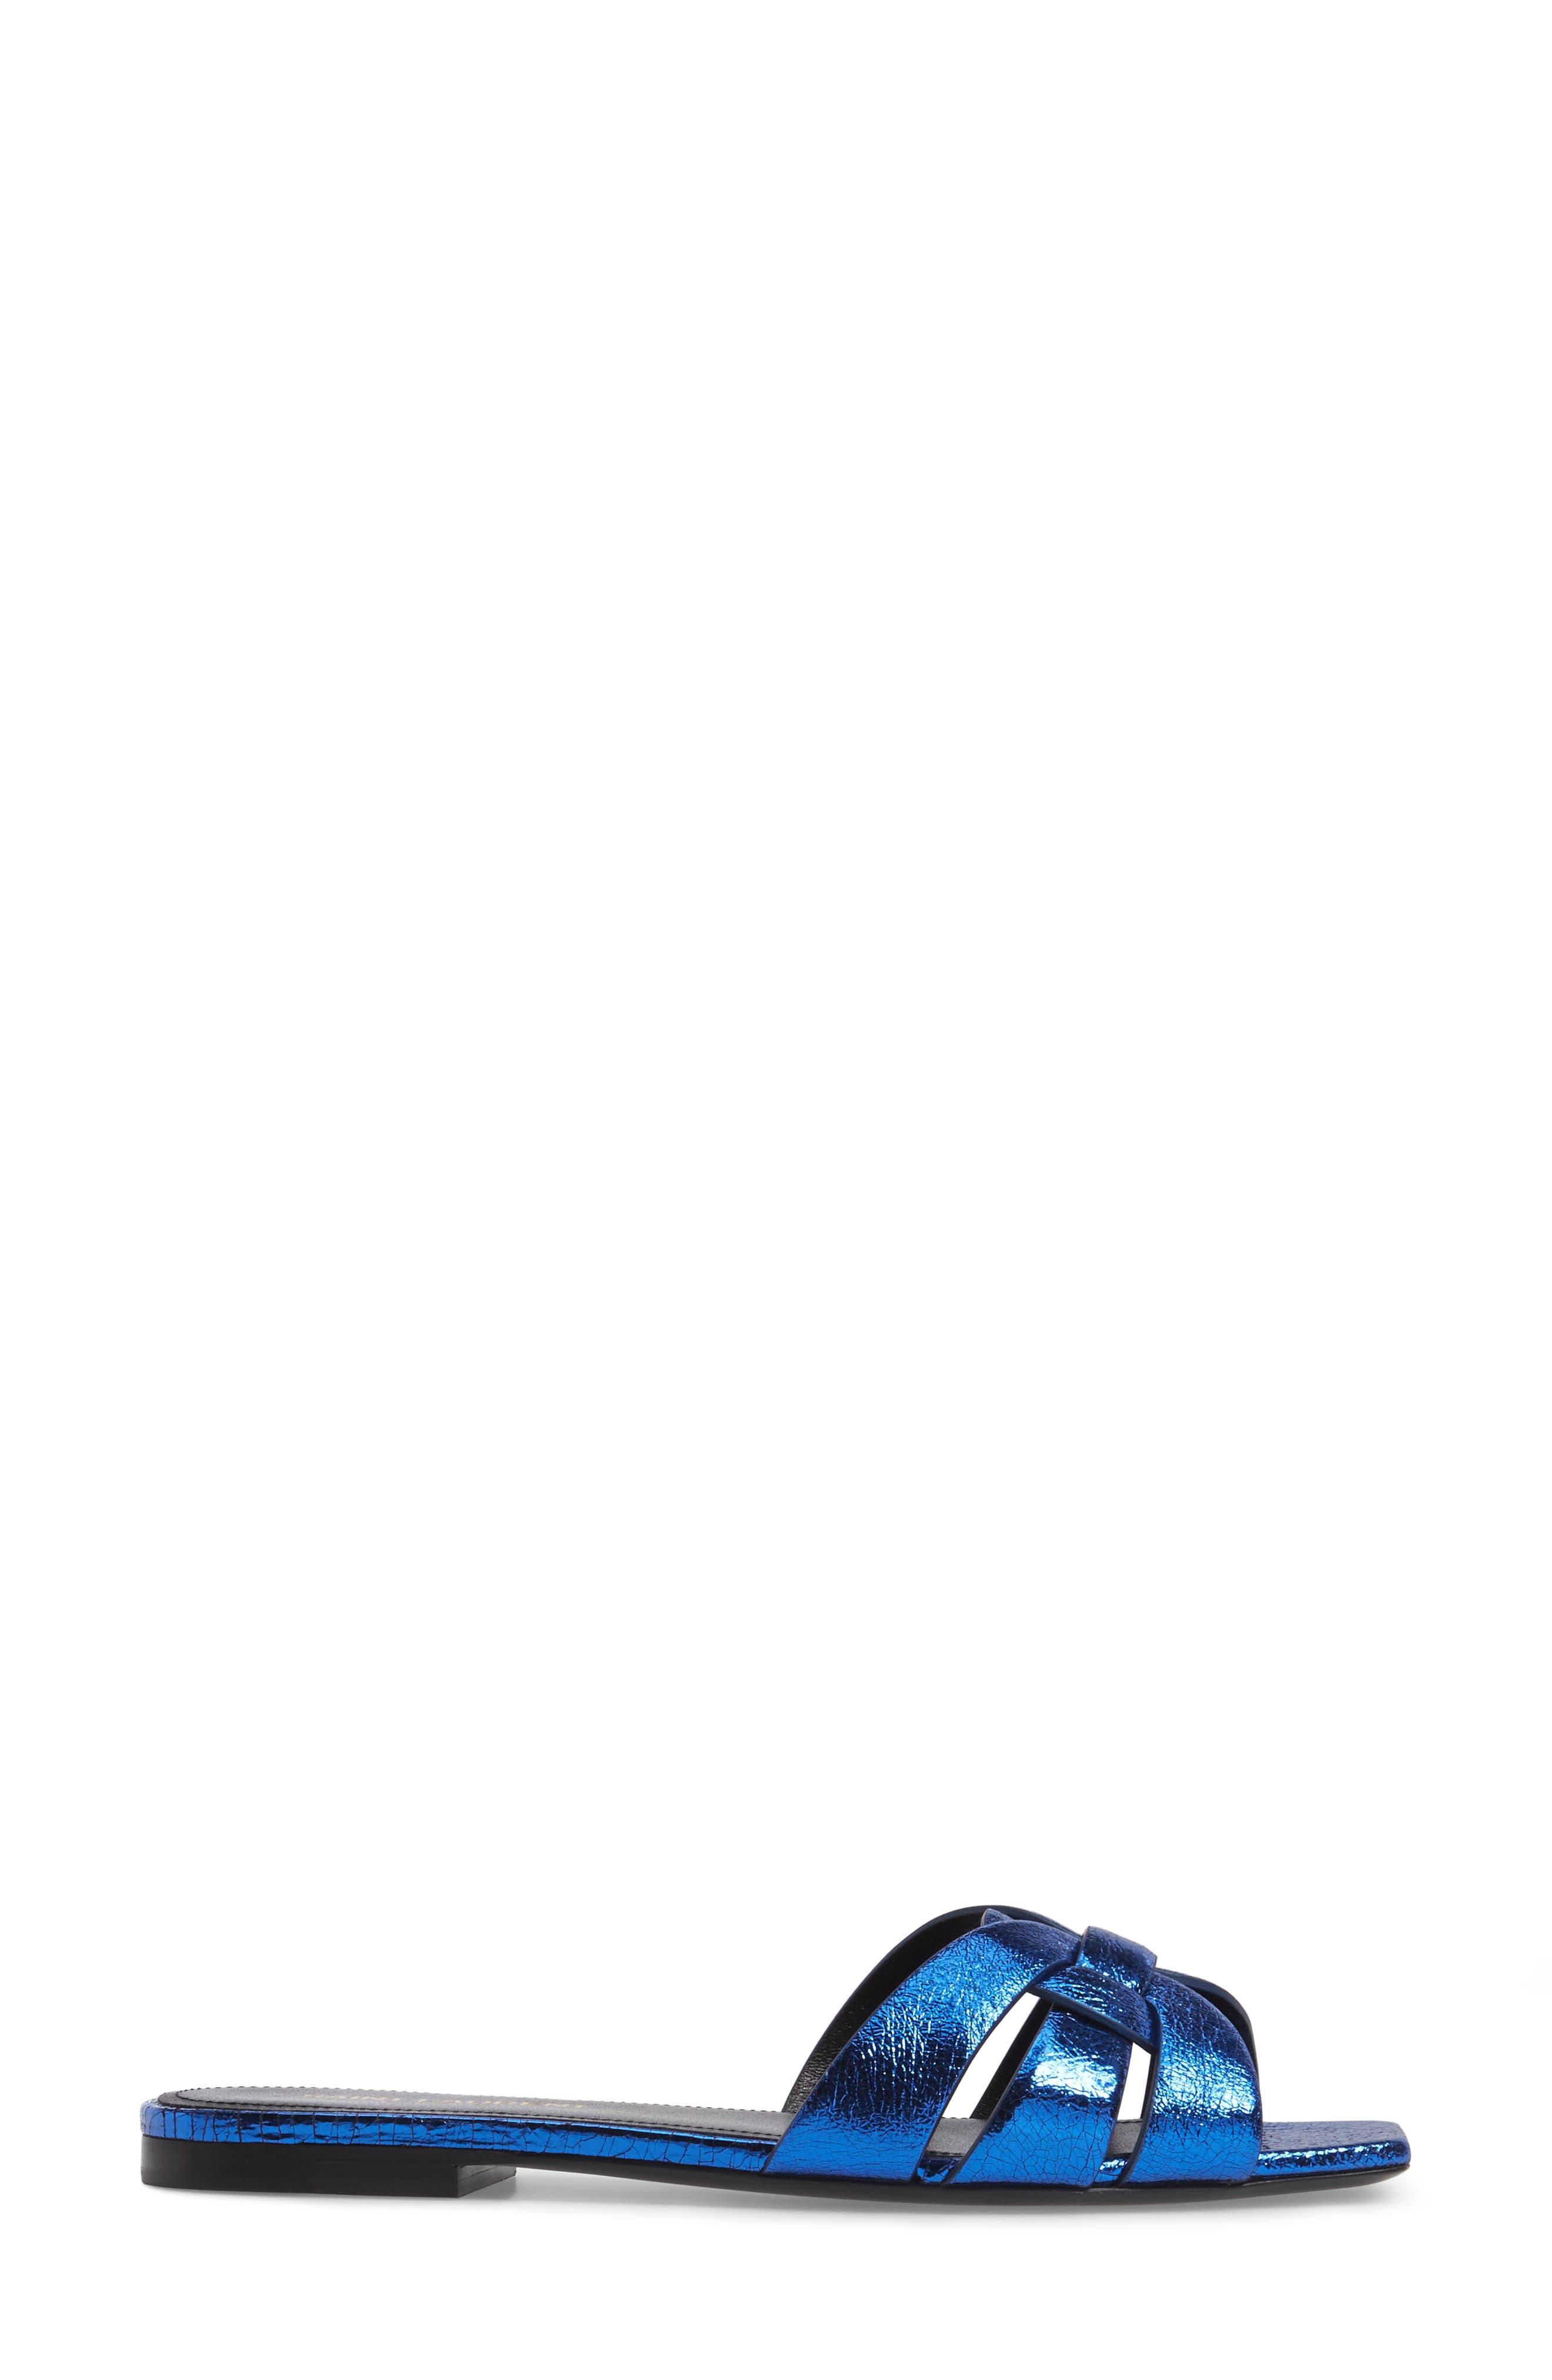 Pieds Metallic Slide Sandal,                             Alternate thumbnail 3, color,                             Blue Metal